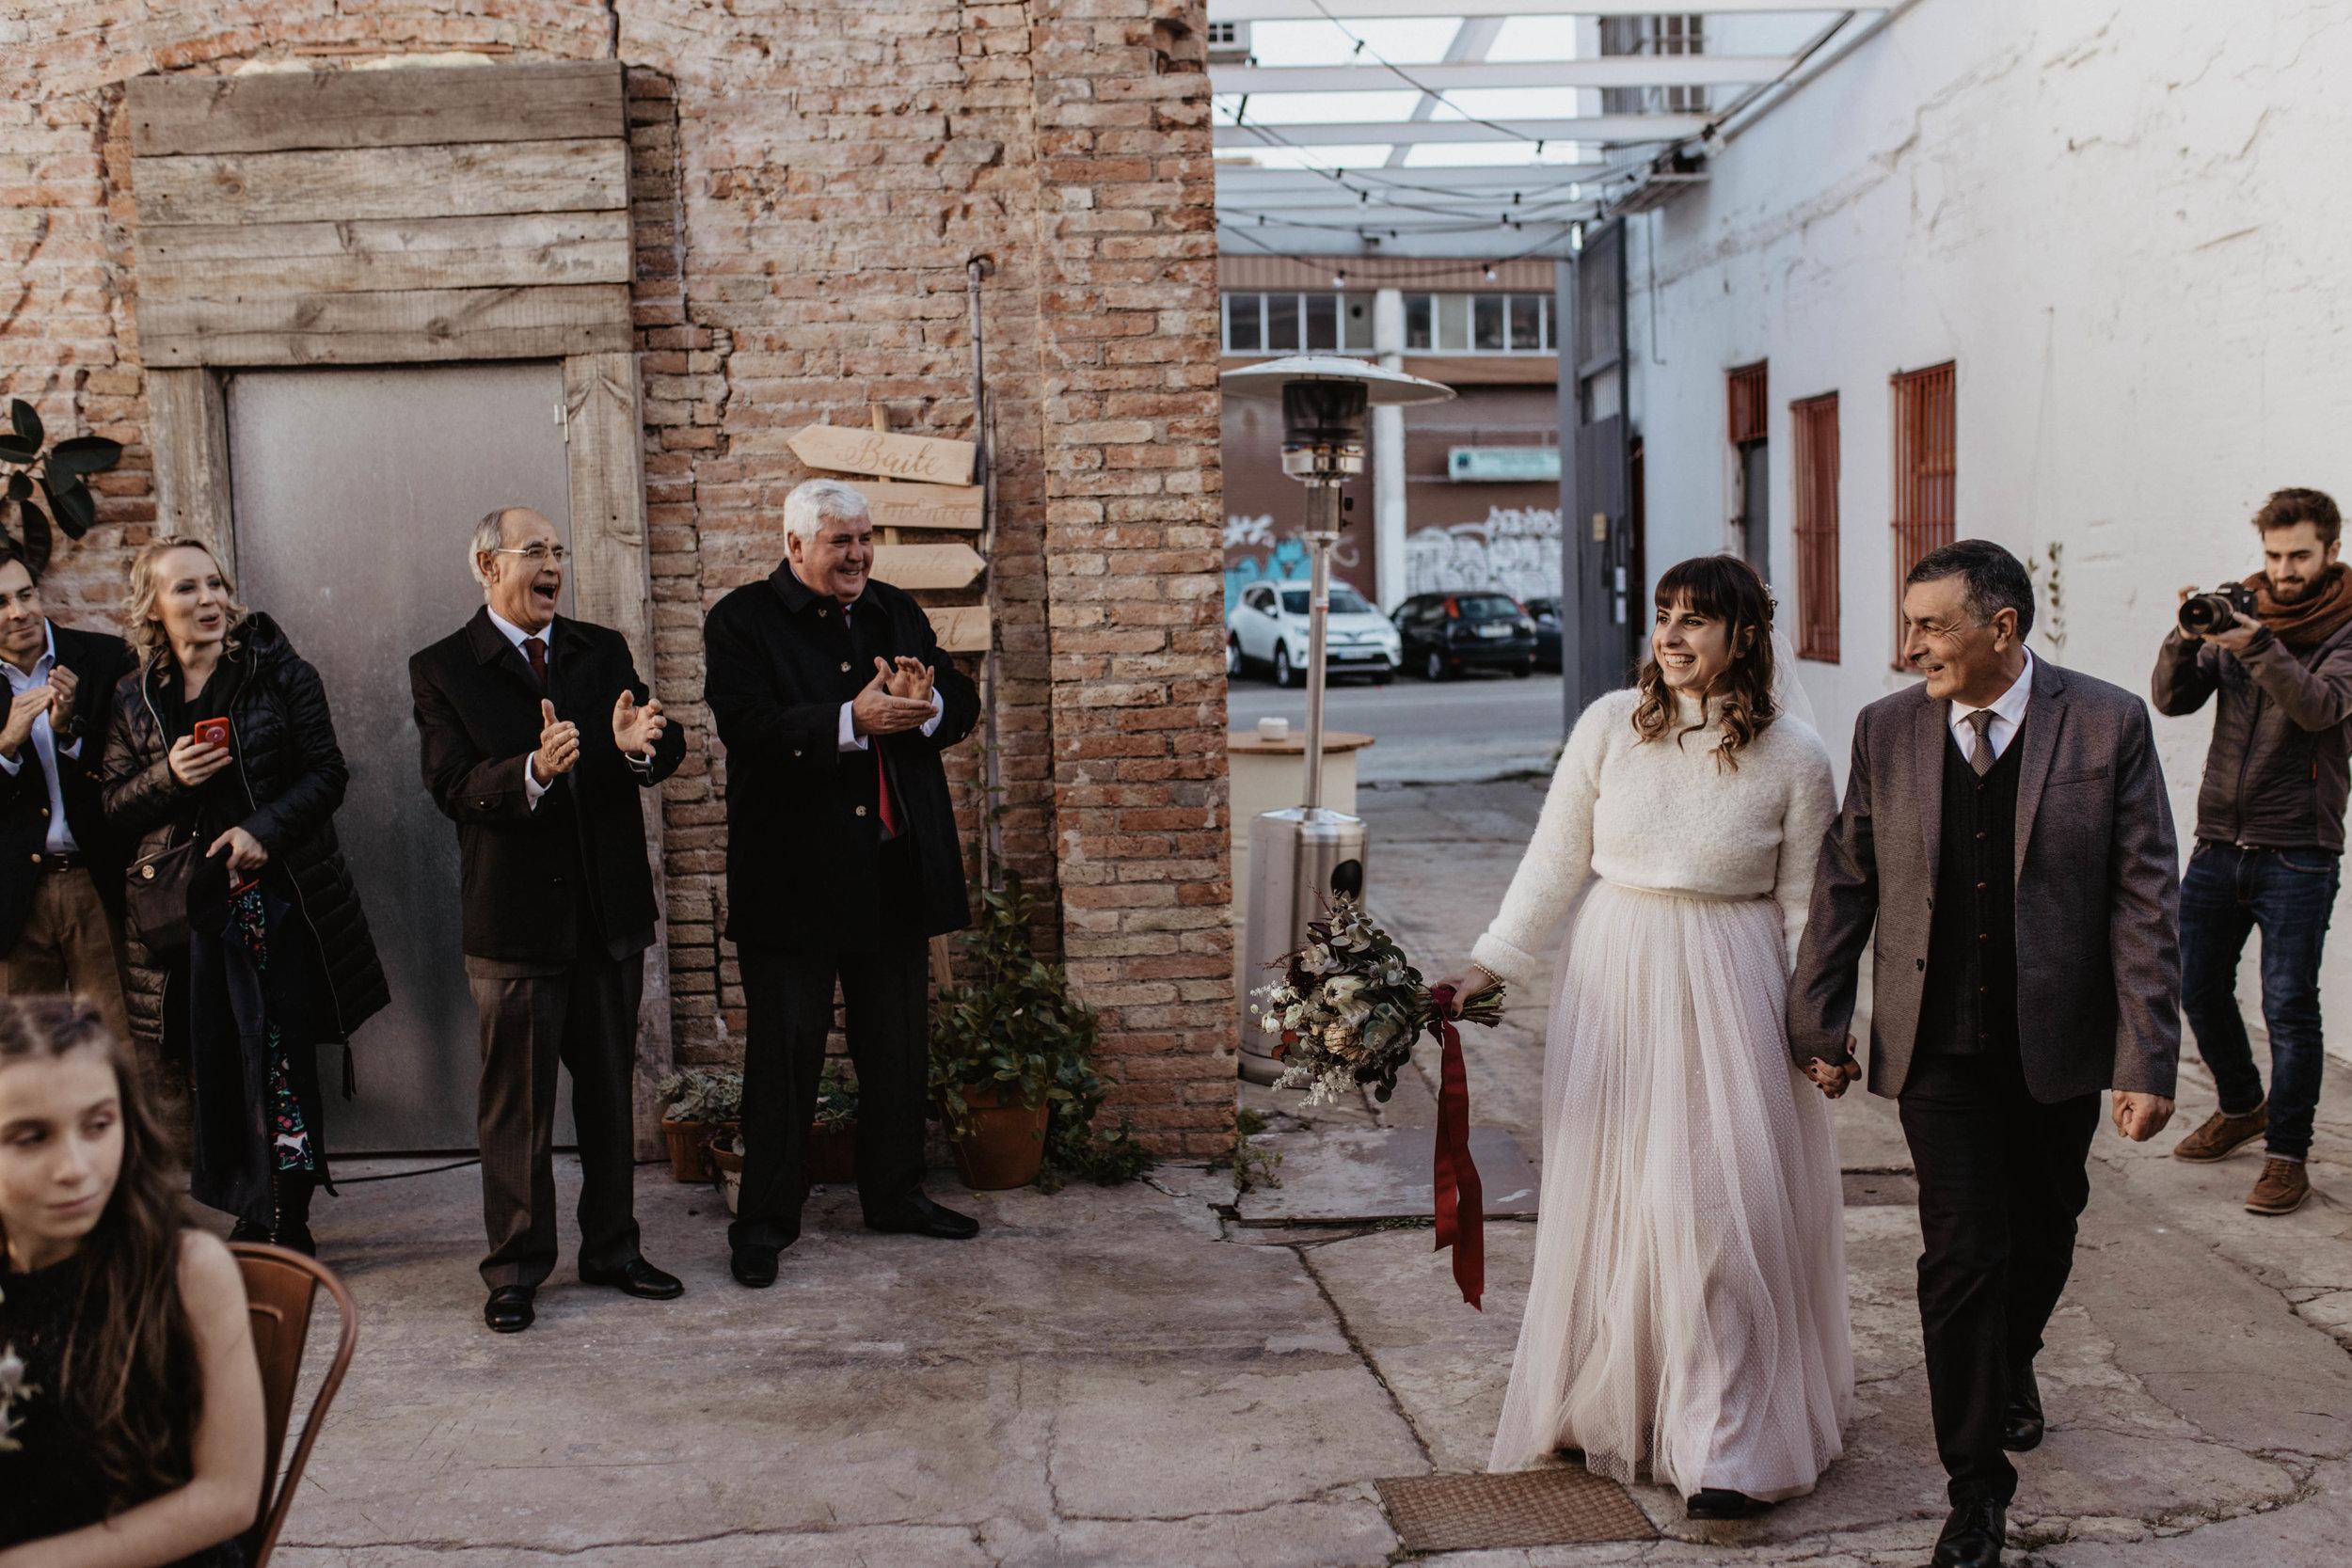 thenortherngirlphotography-photography-weddingphotography-couple-bodasconestilo-bodasenbarcelona-martadavid-552.jpg